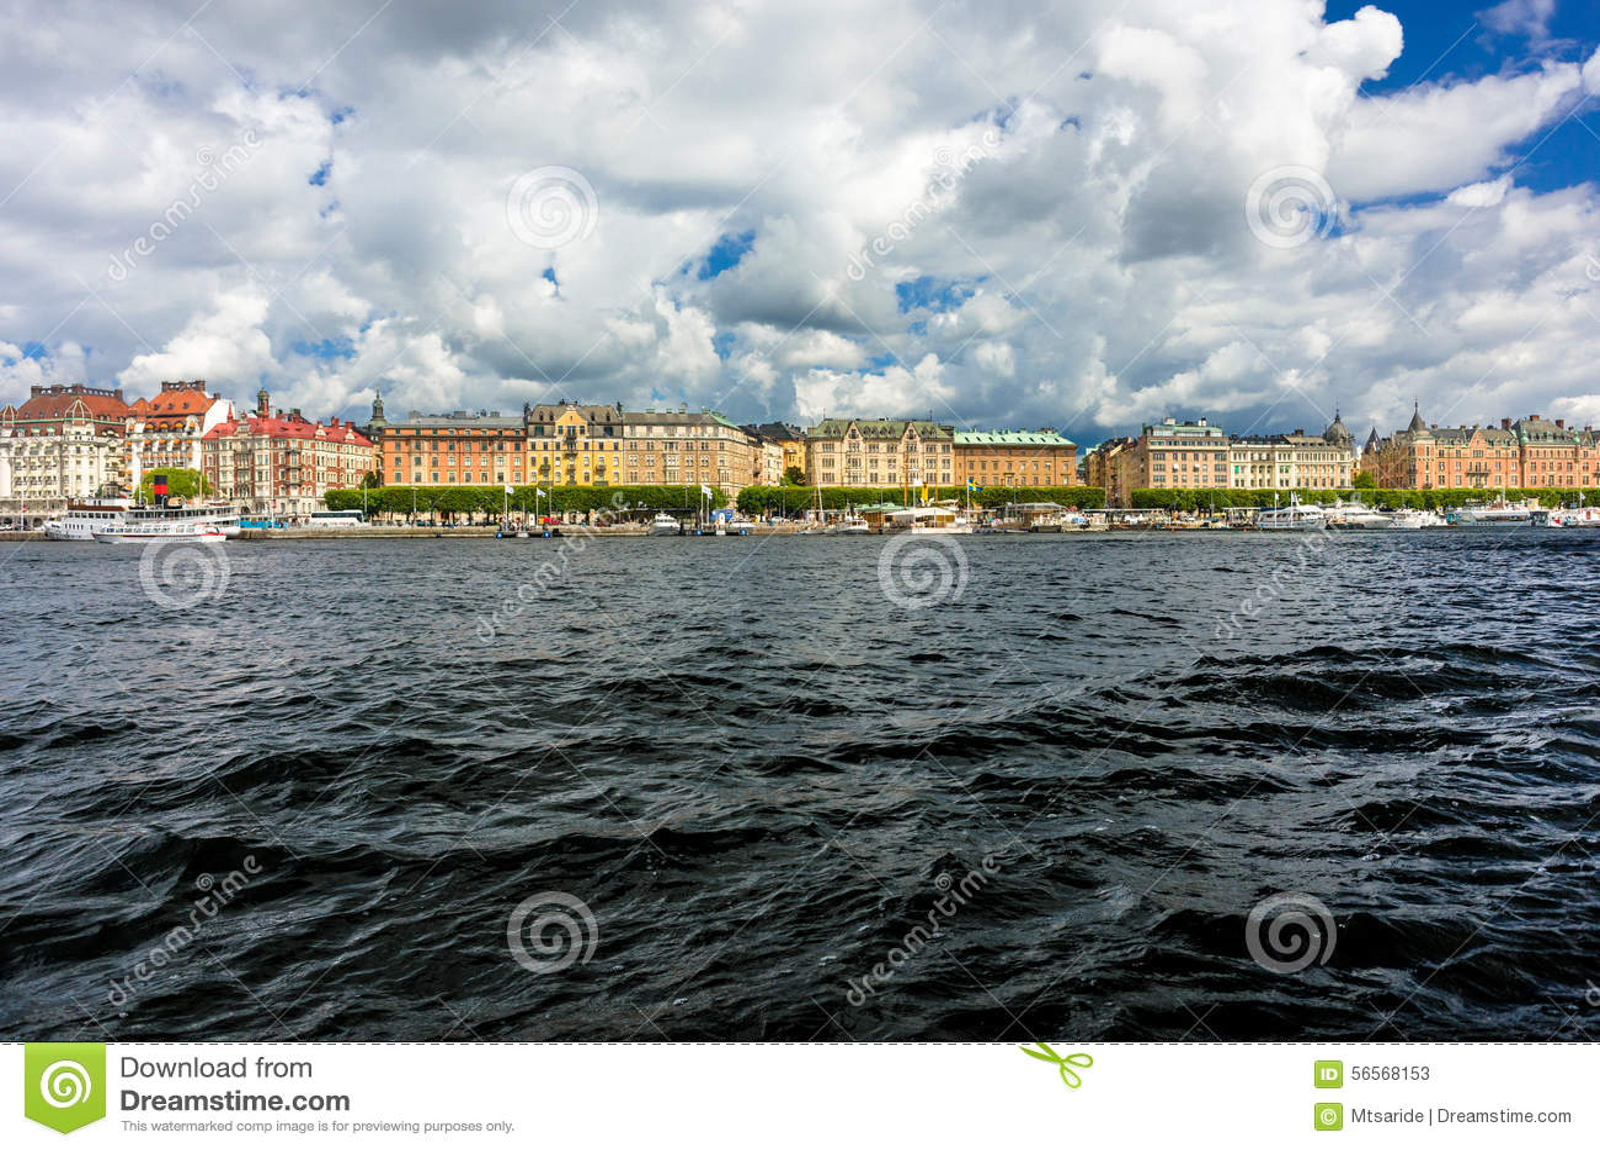 Download Στοκχόλμη από το νερό στοκ εικόνα. εικόνα από λίμνη, ημέρα - 56568153